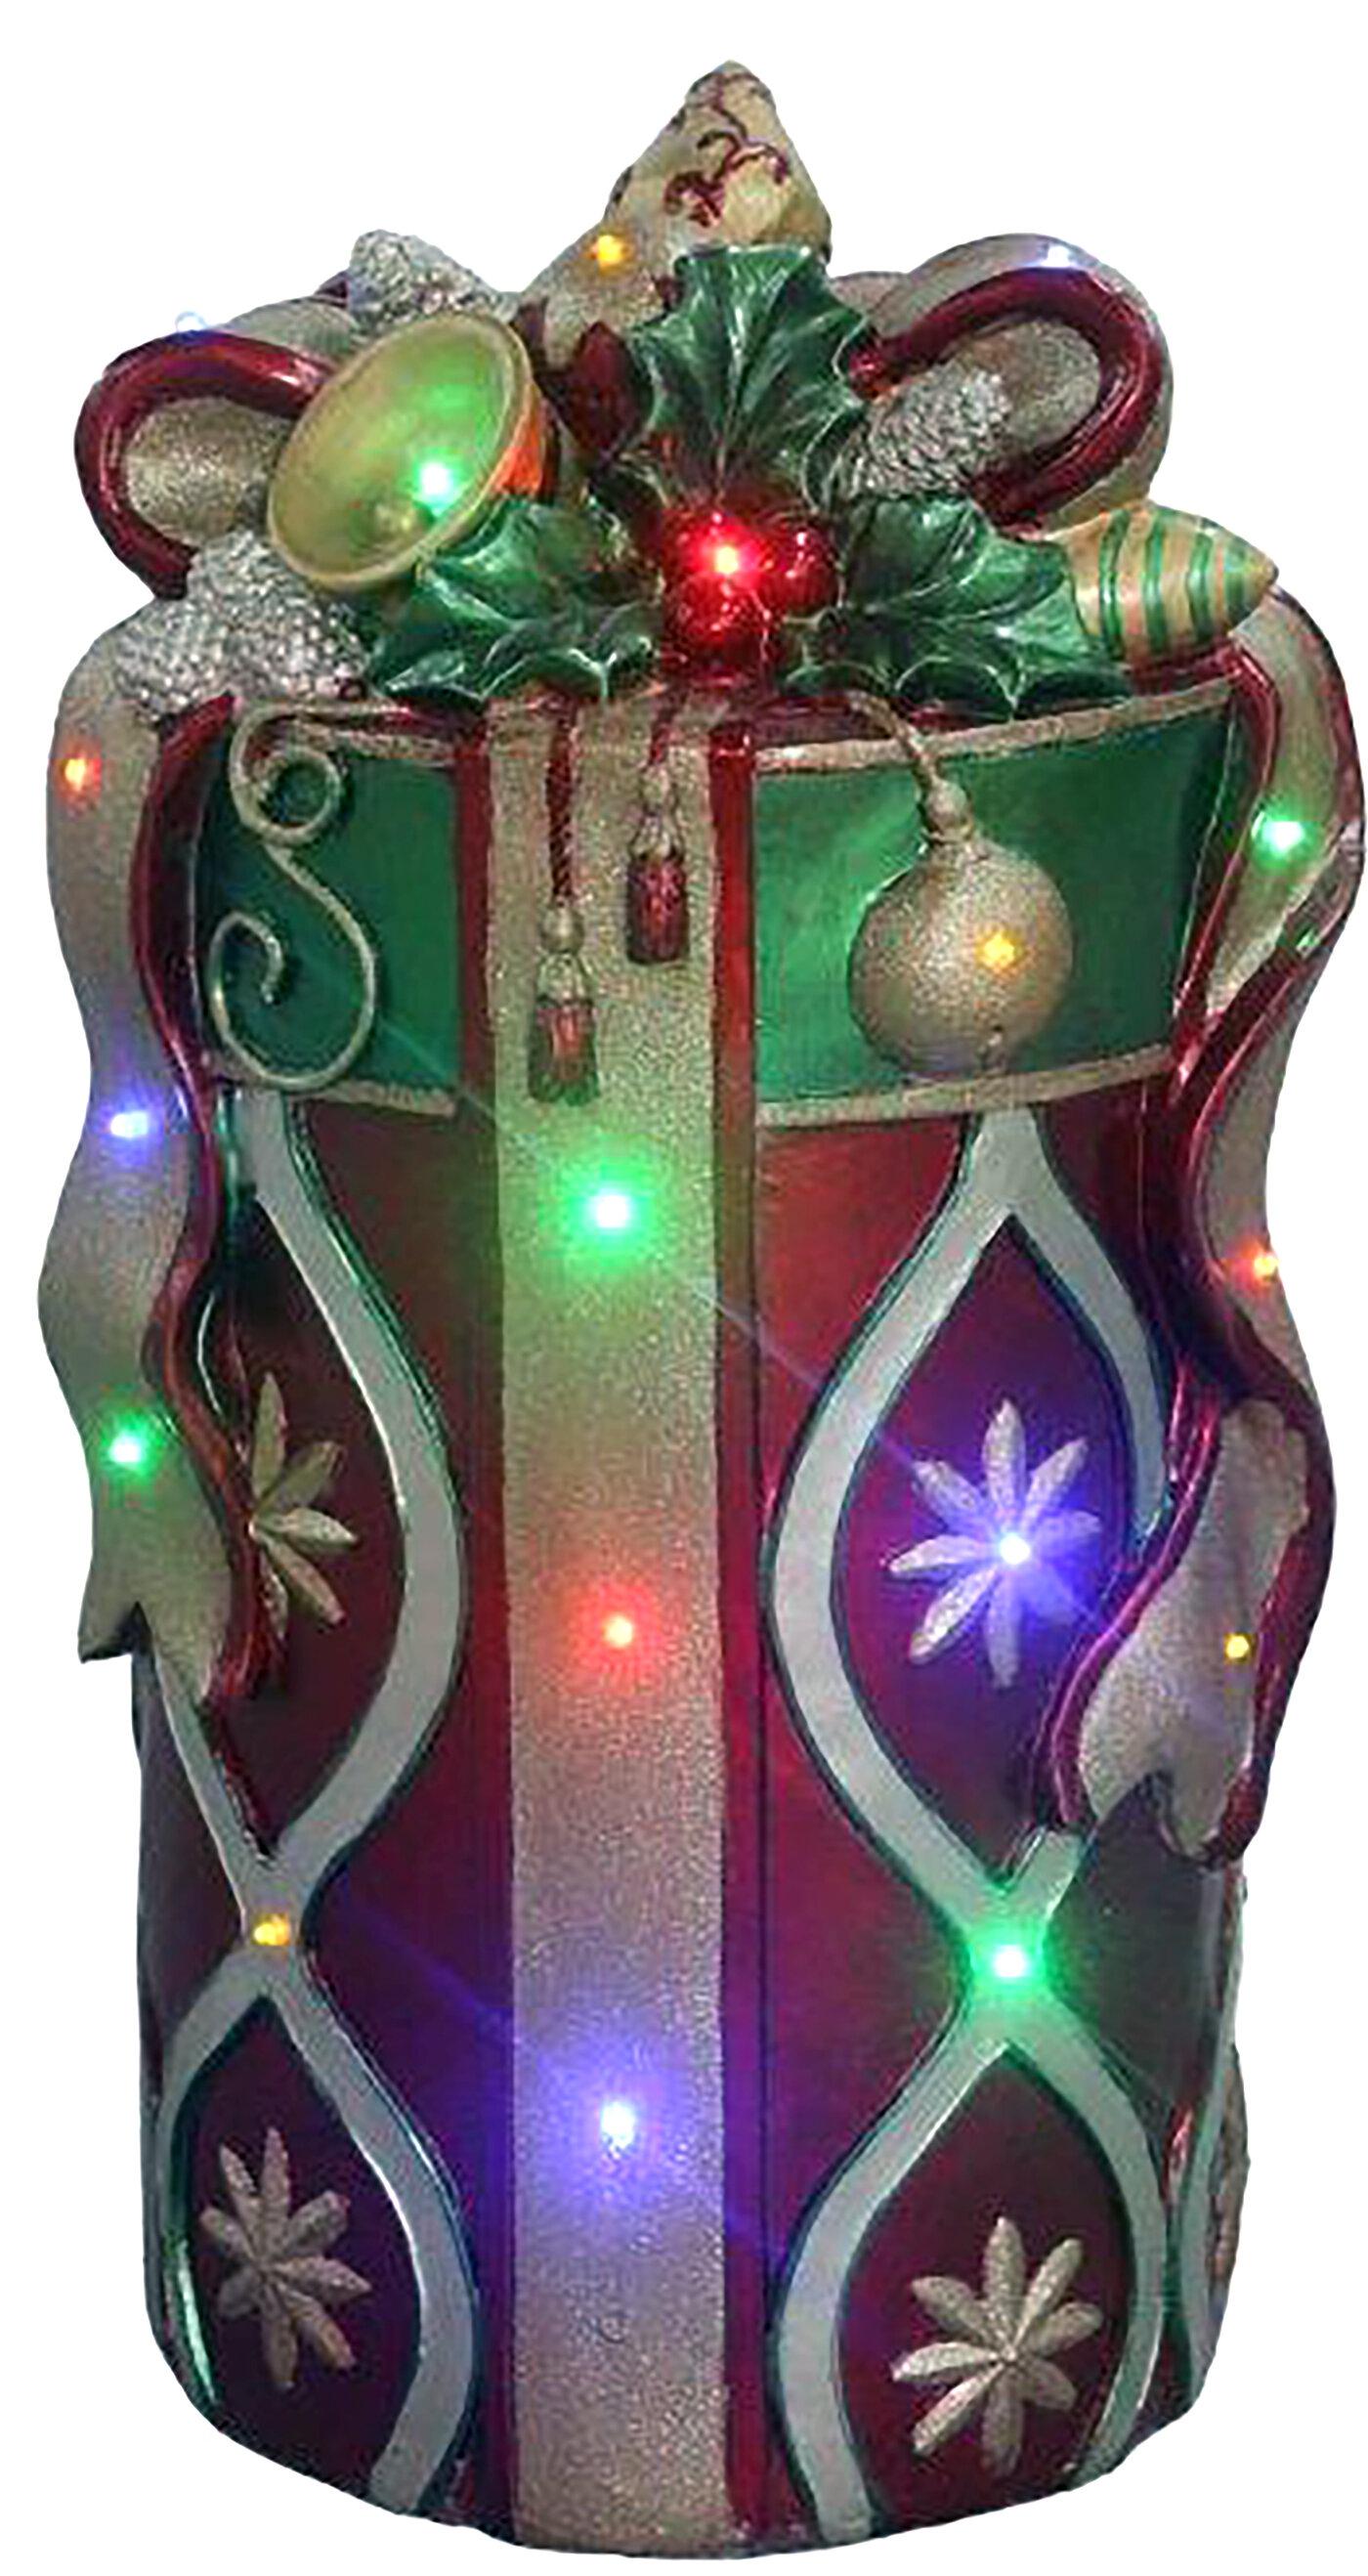 Indoor/Outdoor Oversized Christmas Decor Decorative Accent